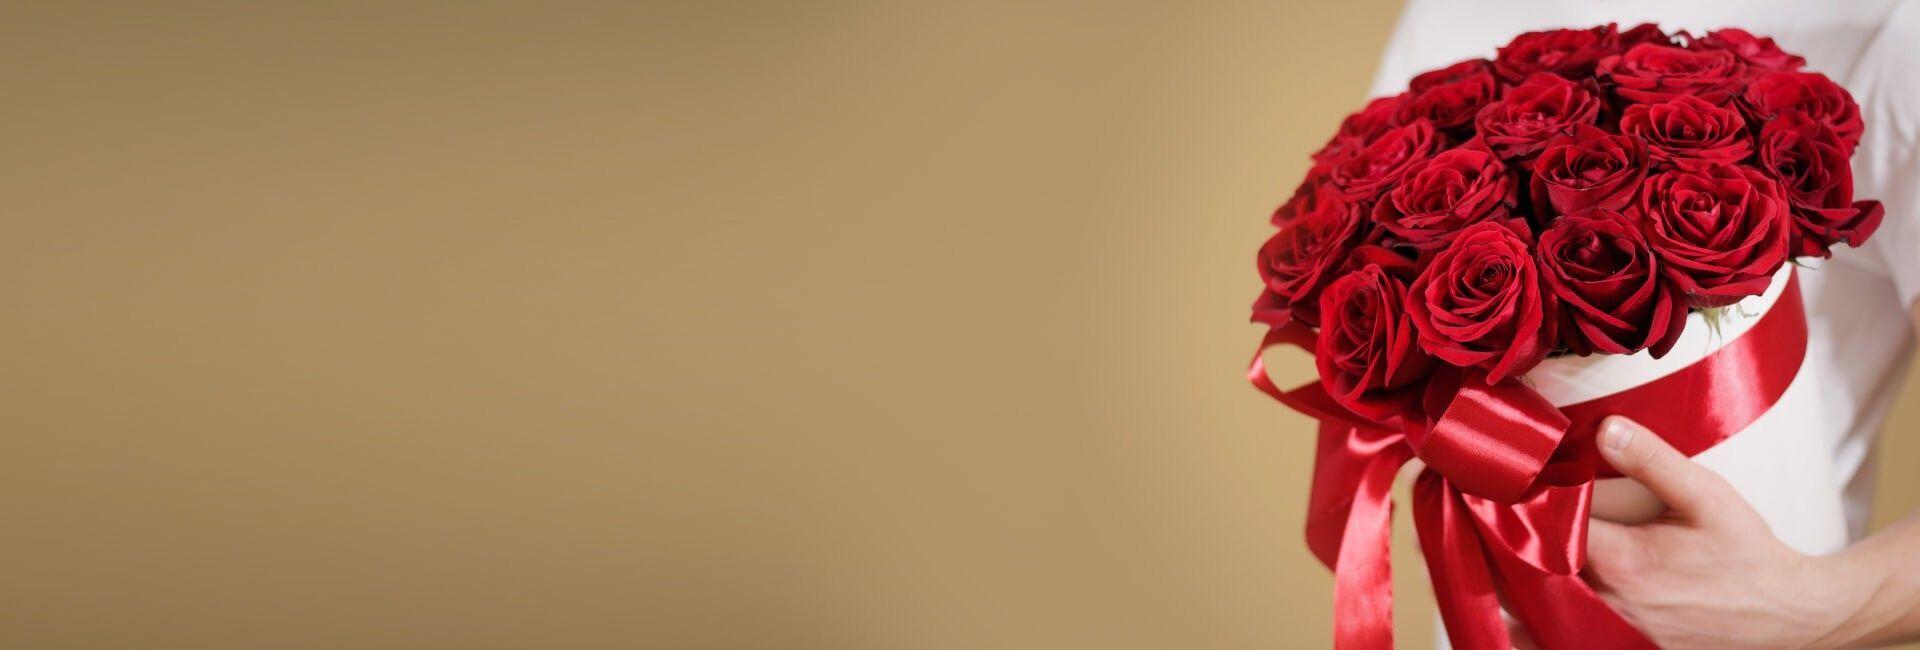 Valentines Day Flower Gifts CT